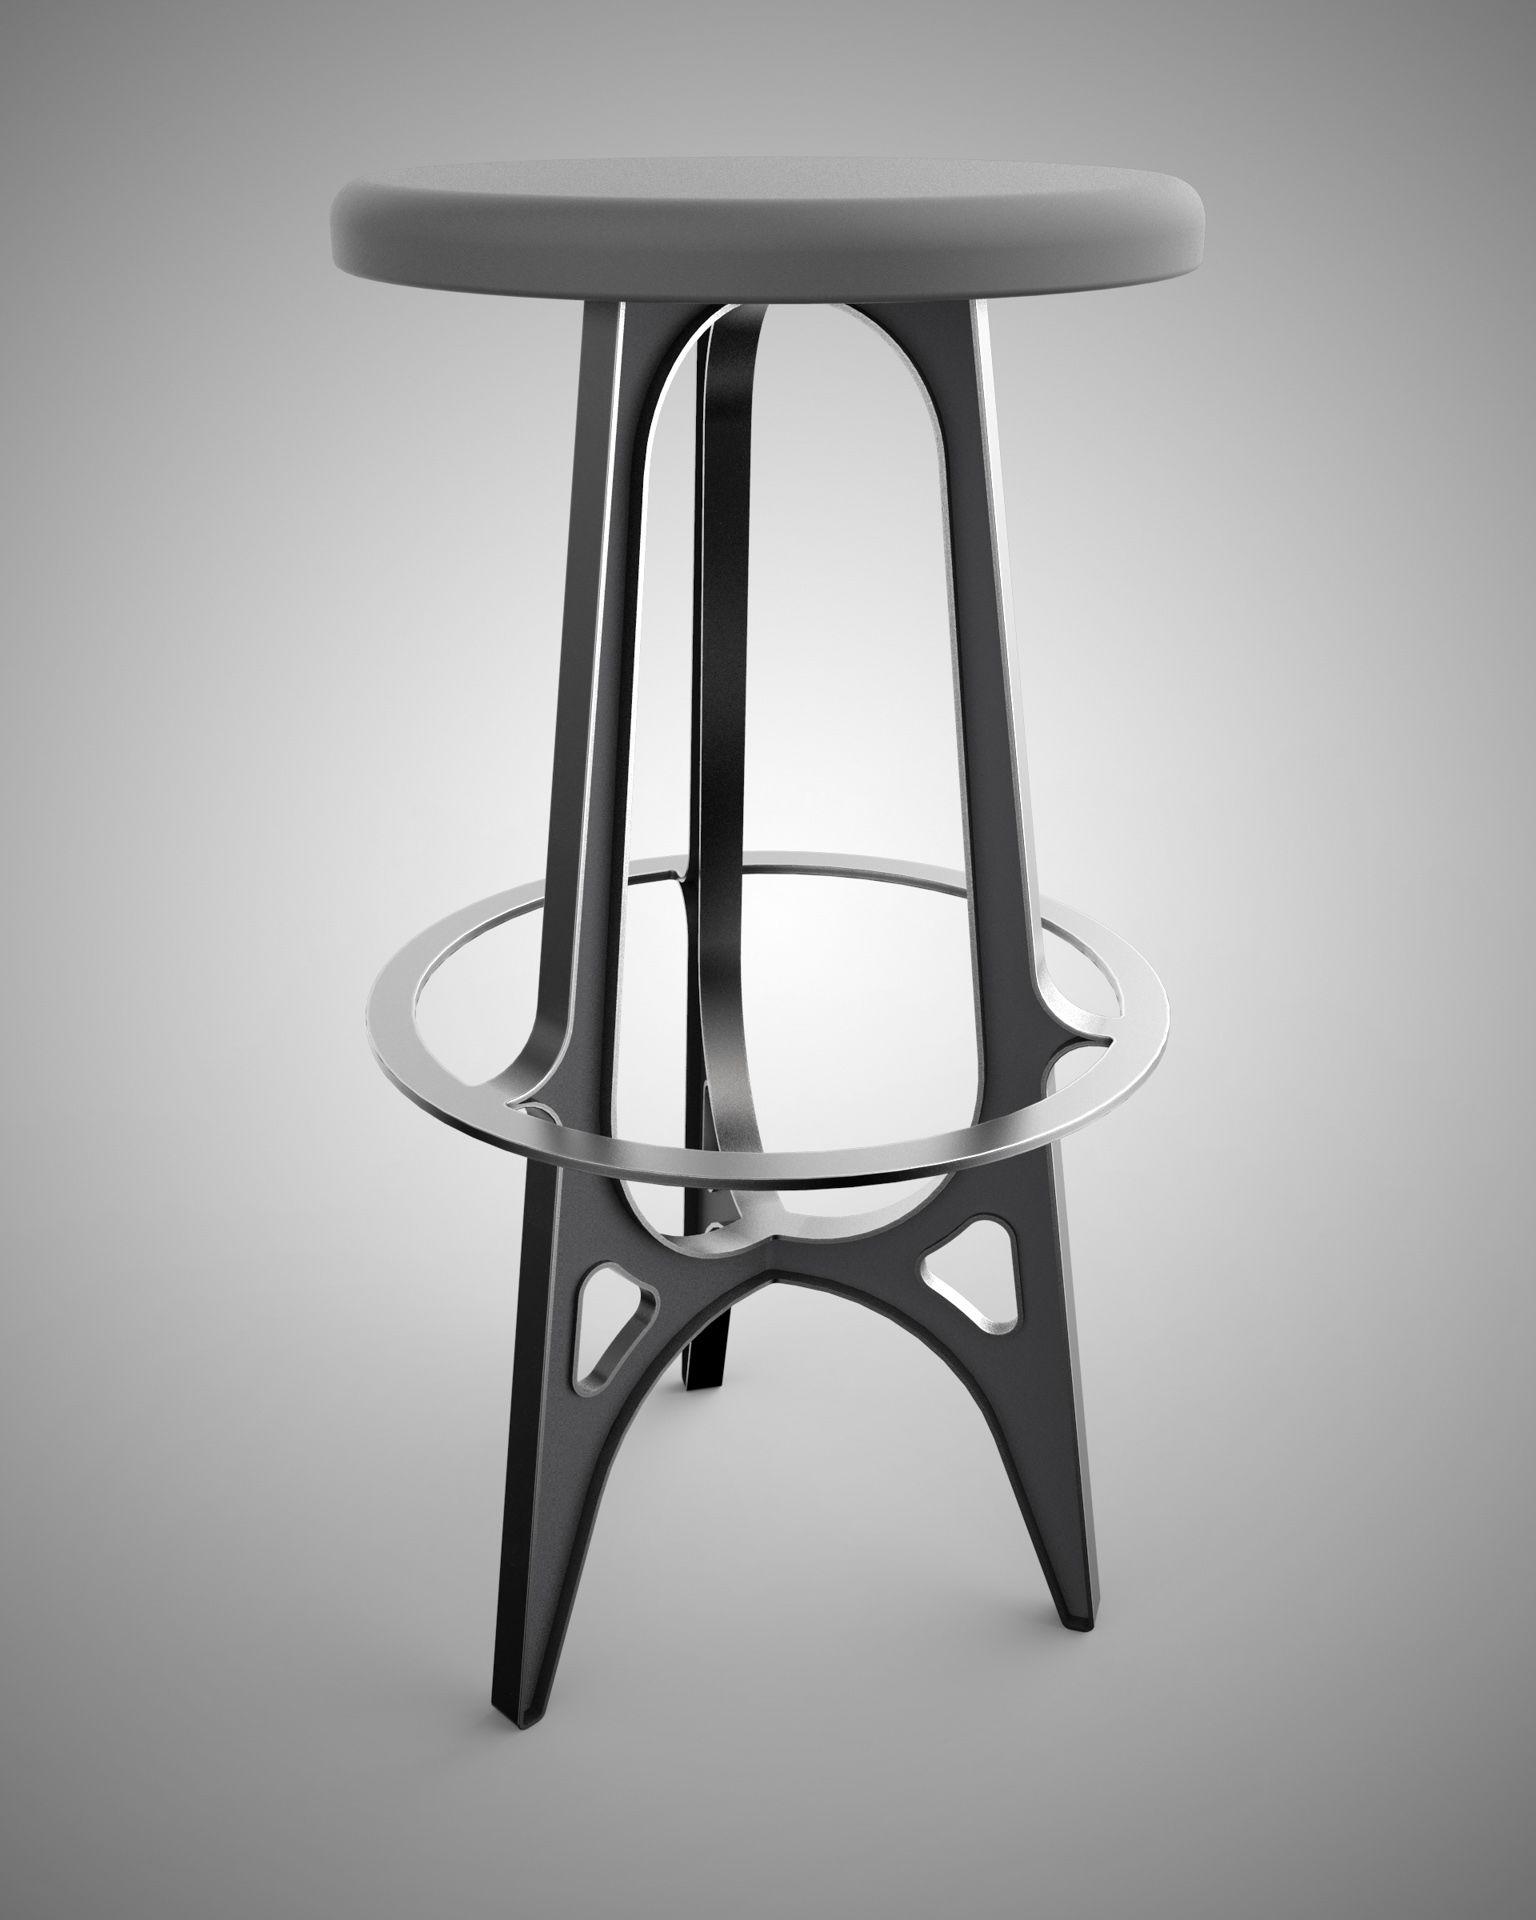 Retro Futuristic Chair Tables Industrial Bathroom Decor Industrial Living Room Furniture Industrial Furniture Wood